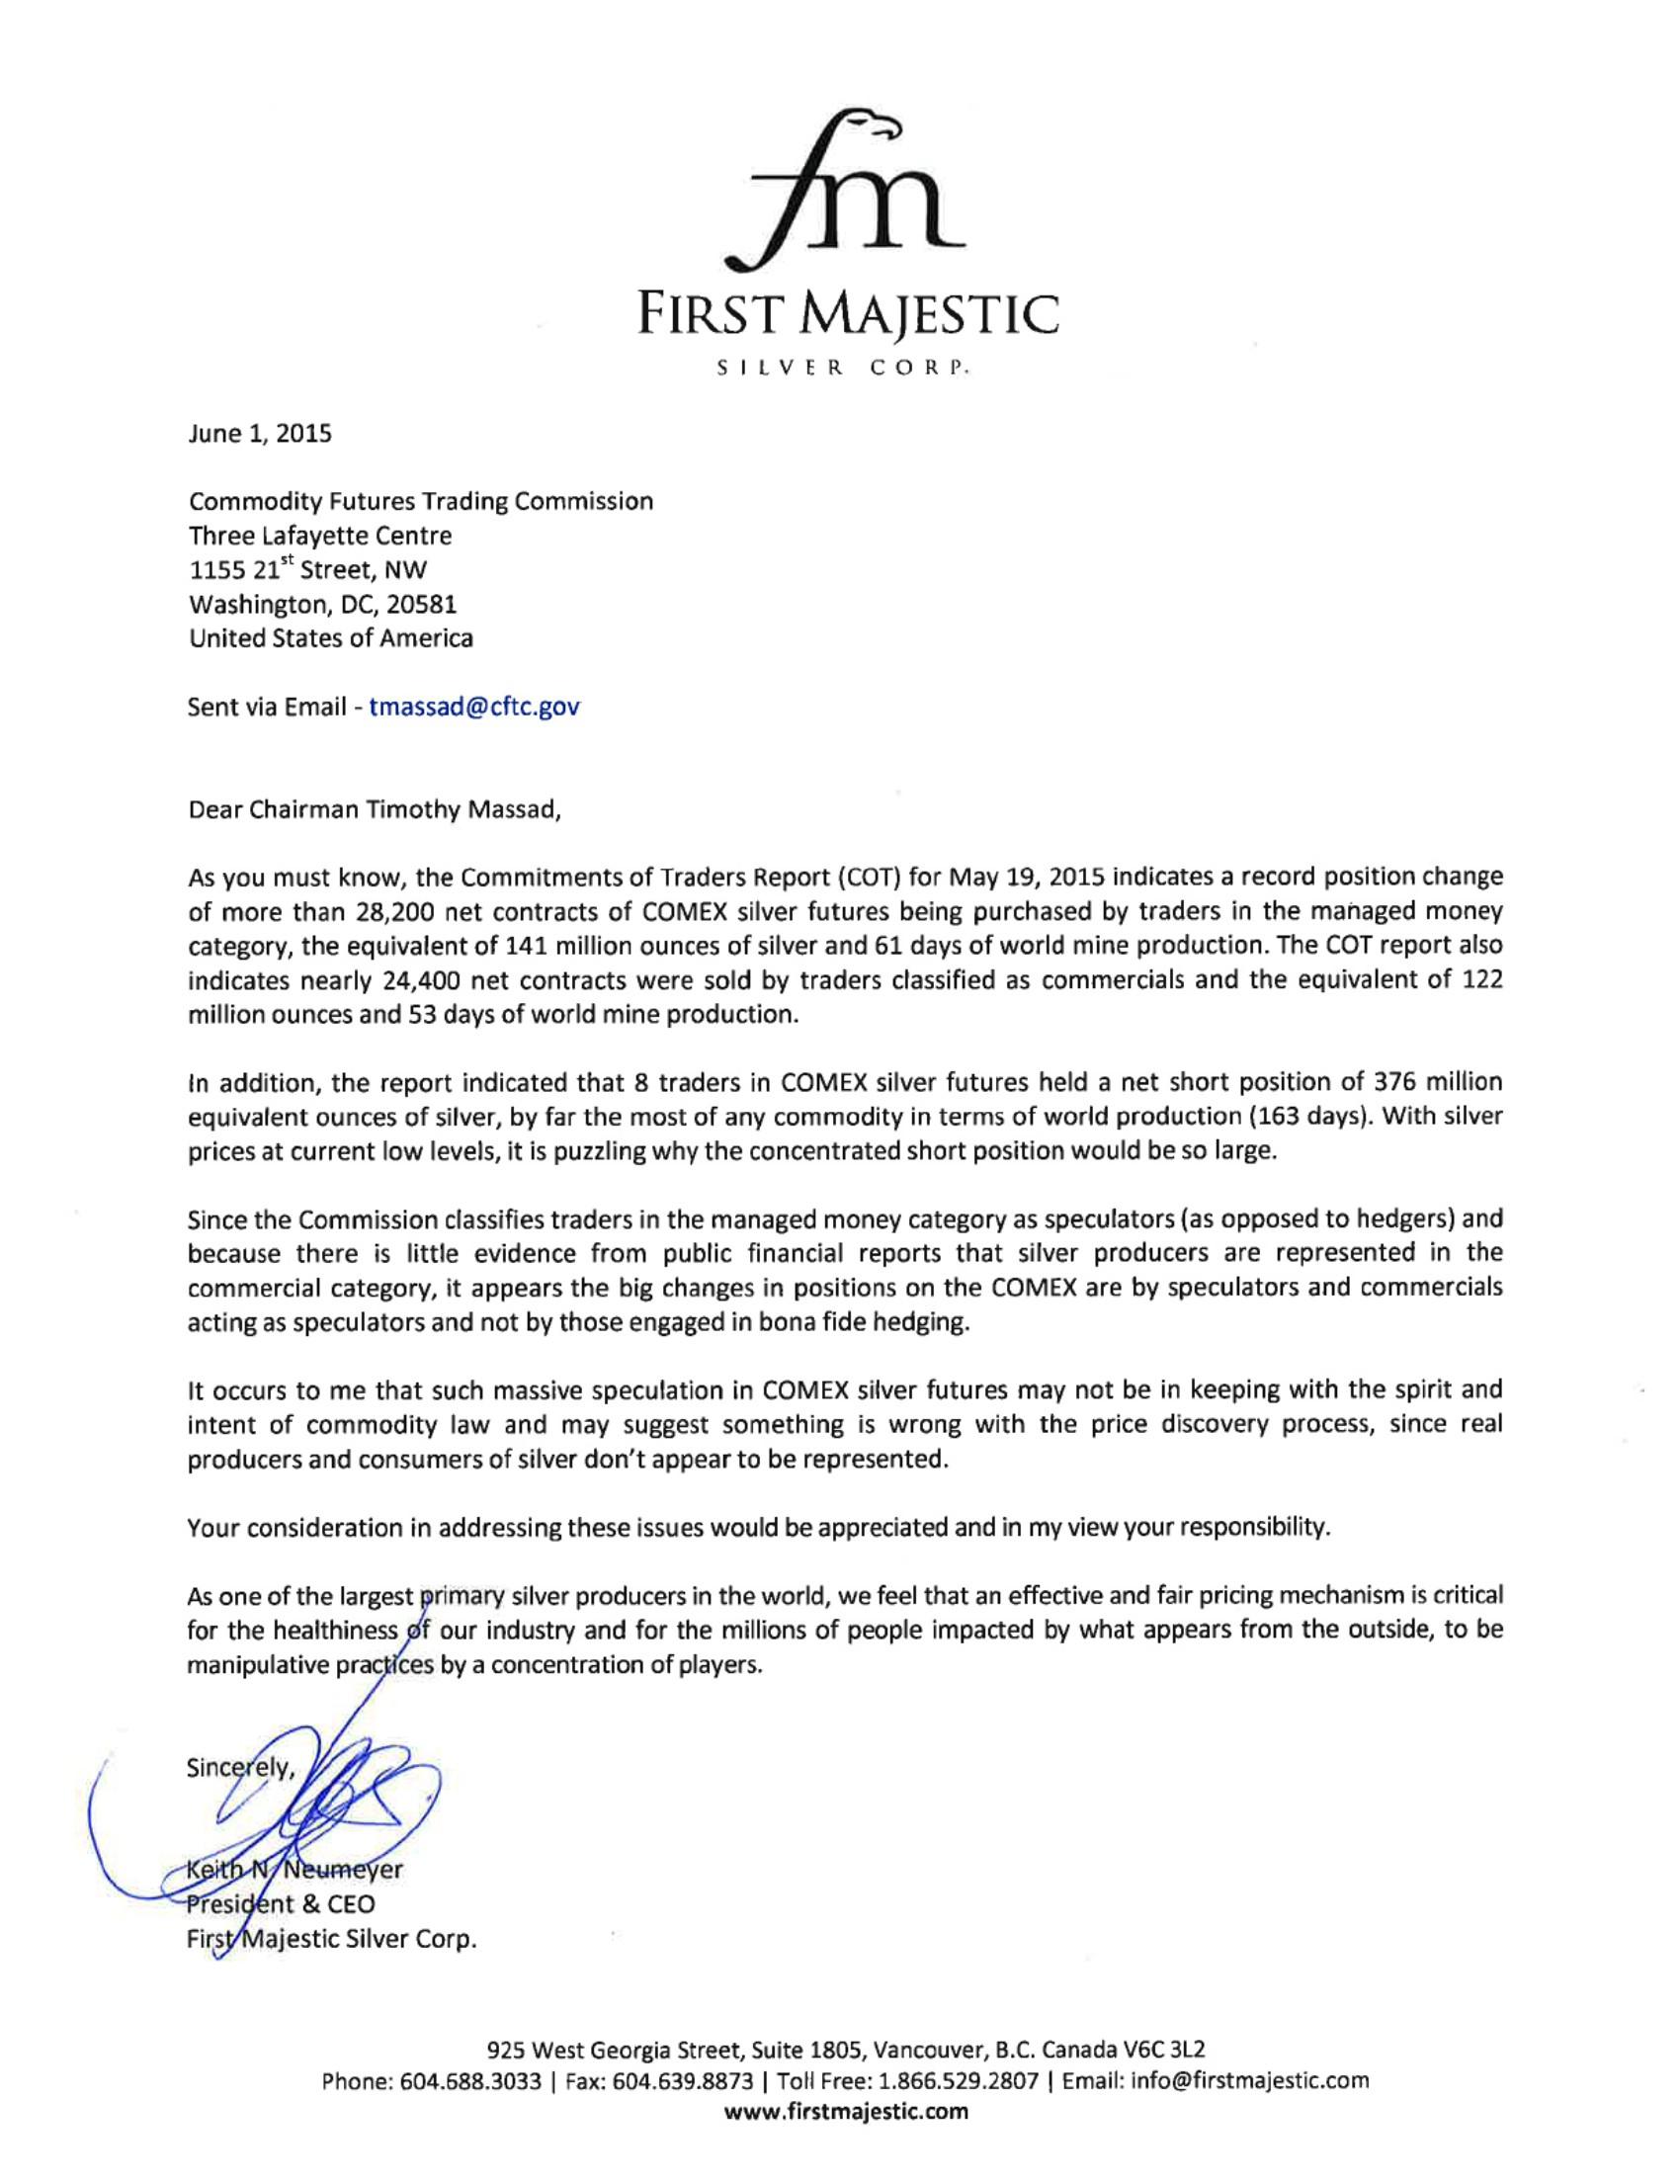 osha response letter template example-Cp2000 Response Letter Template Samples Response Letters to Customer Plaints Best Osha Plaint 11-h